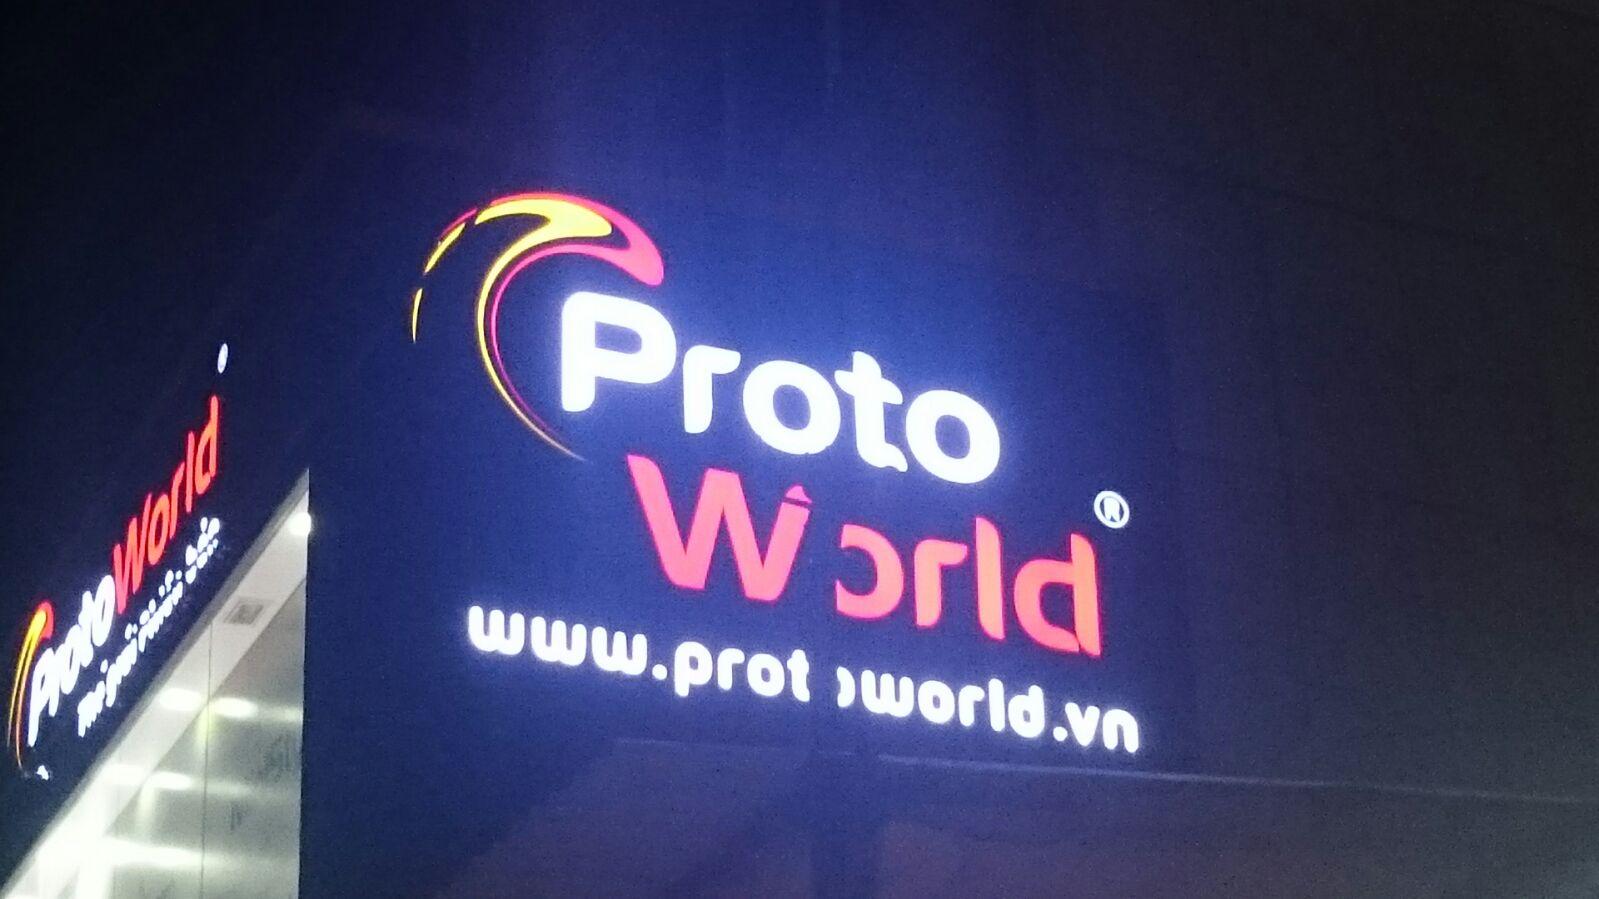 Proto World